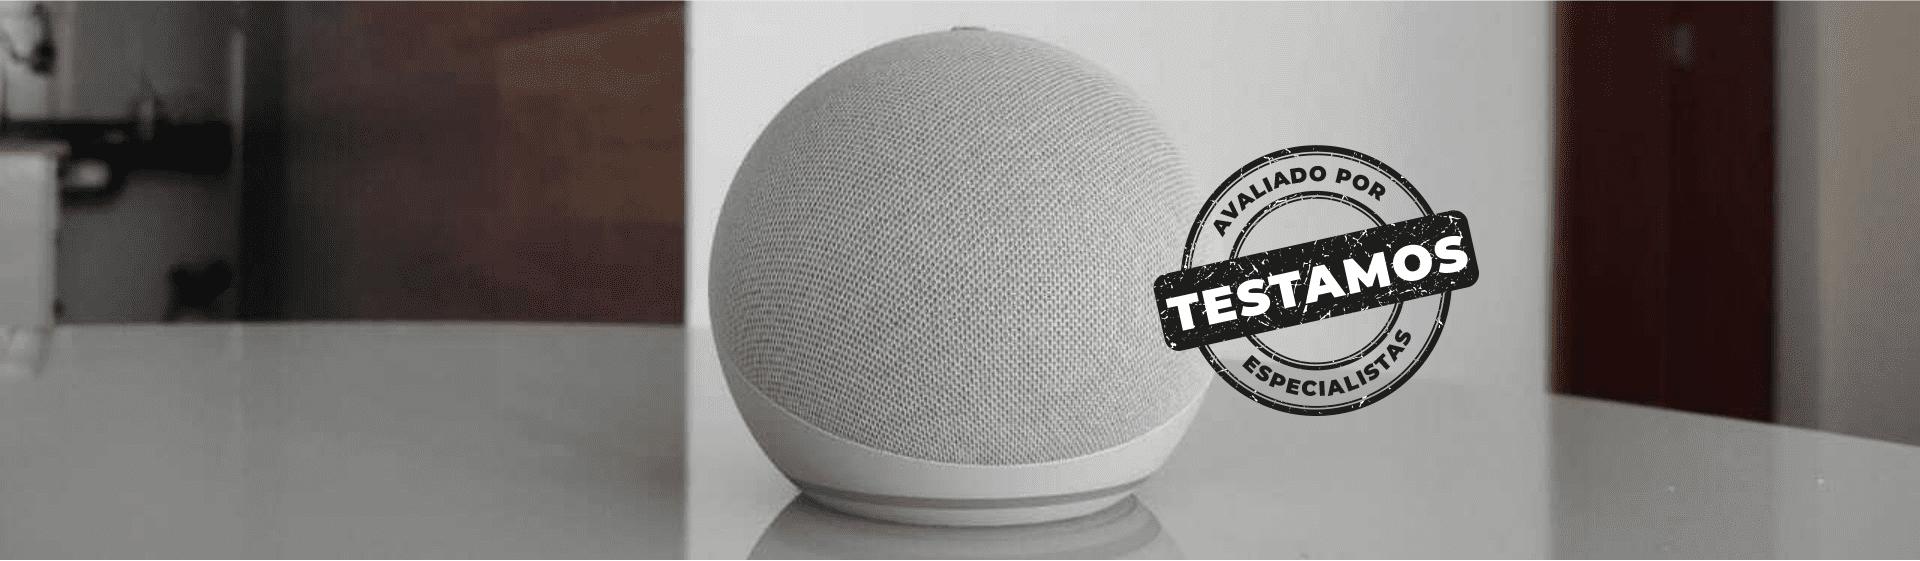 Echo Dot 4: testamos esse smart speaker da Amazon